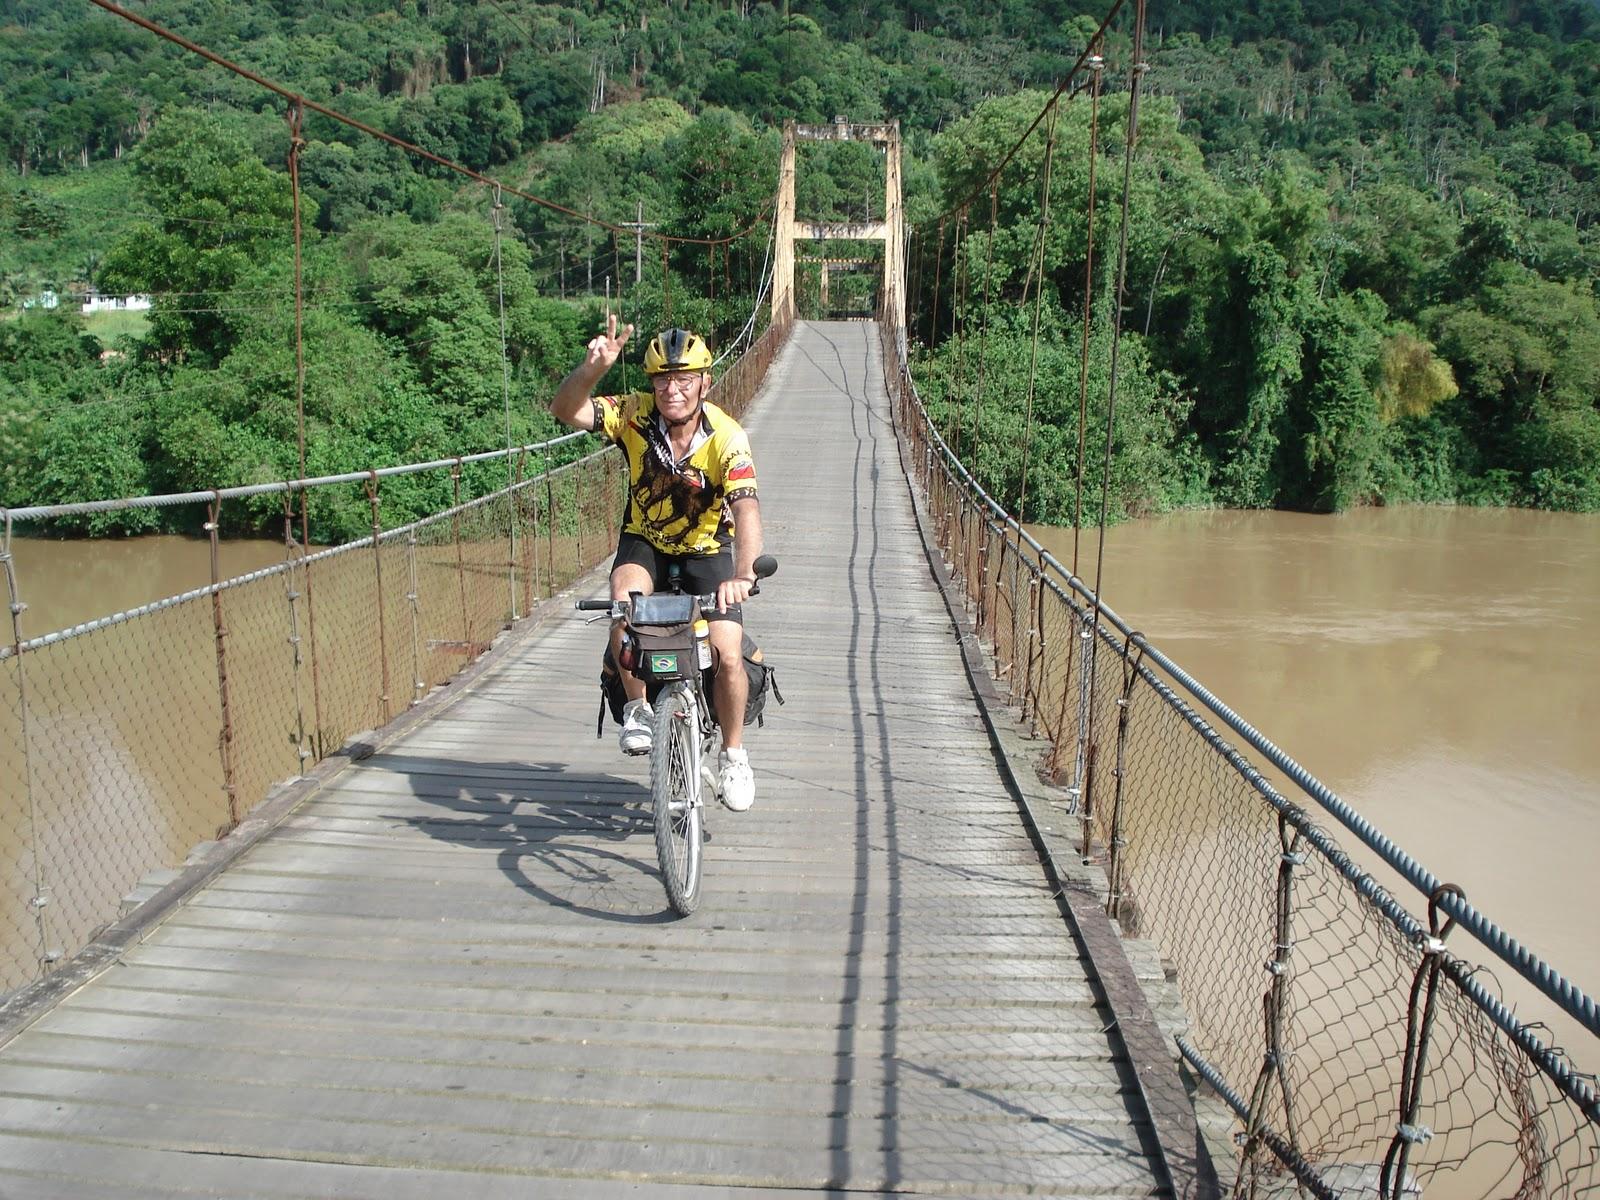 Circuito Vale Europeu : Circuito vale europeu bike turismo sul